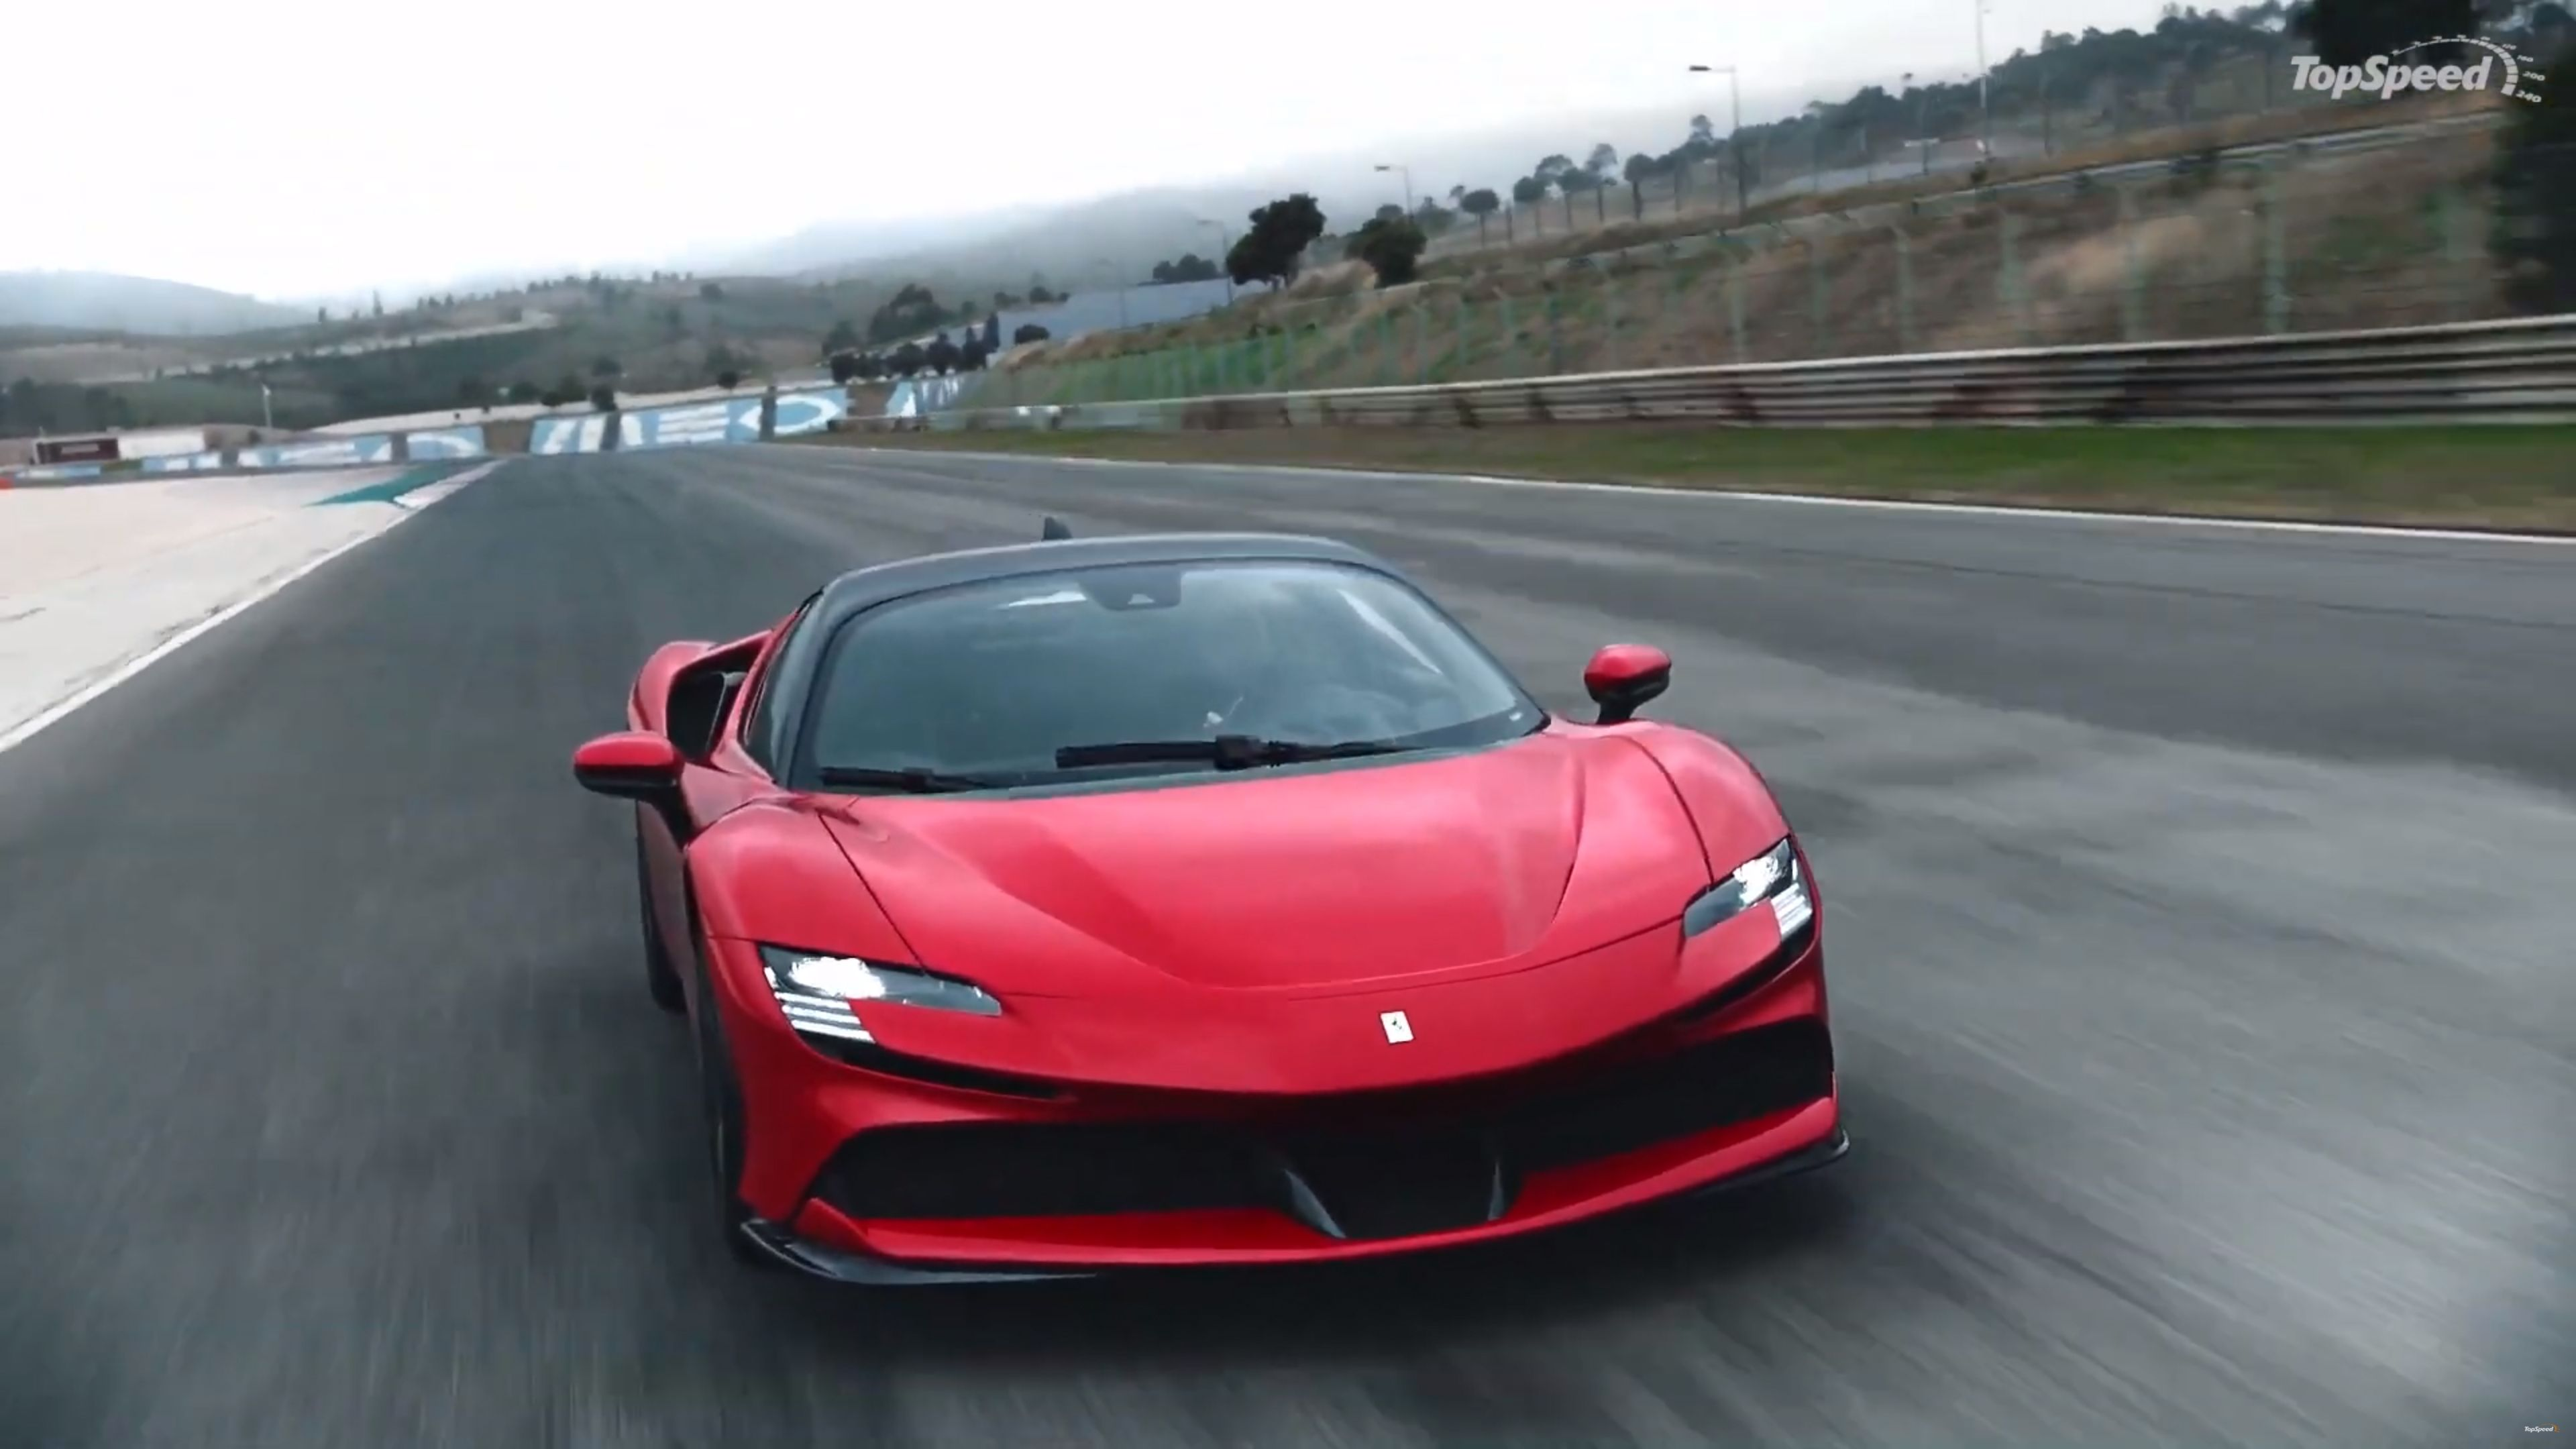 16+ Ferrari hybrid supercar Free